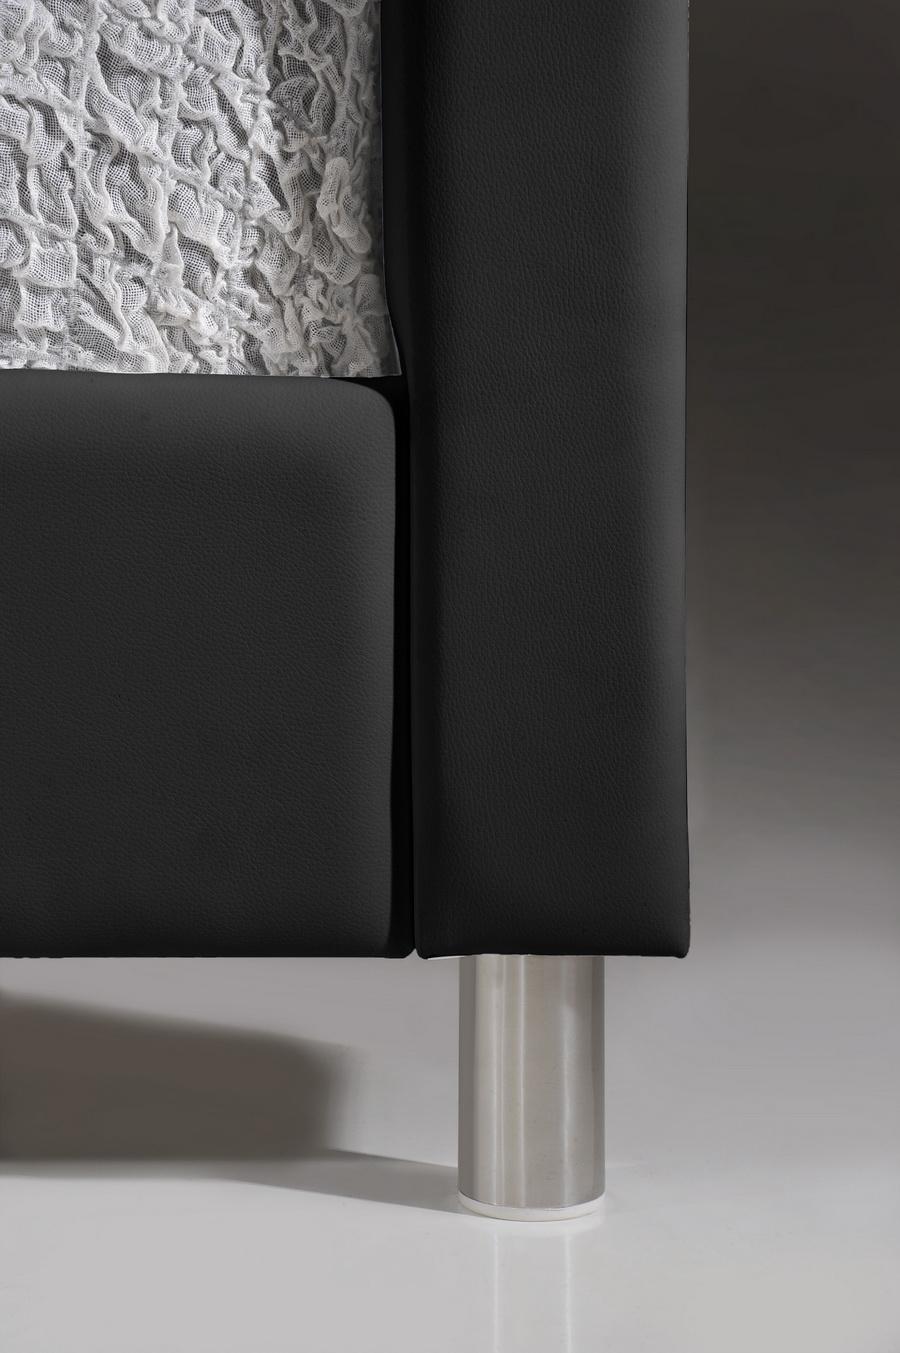 Baxton Studio Carlotta Black Modern Bed With Upholstered Headboard Queen Size Iebbt6376